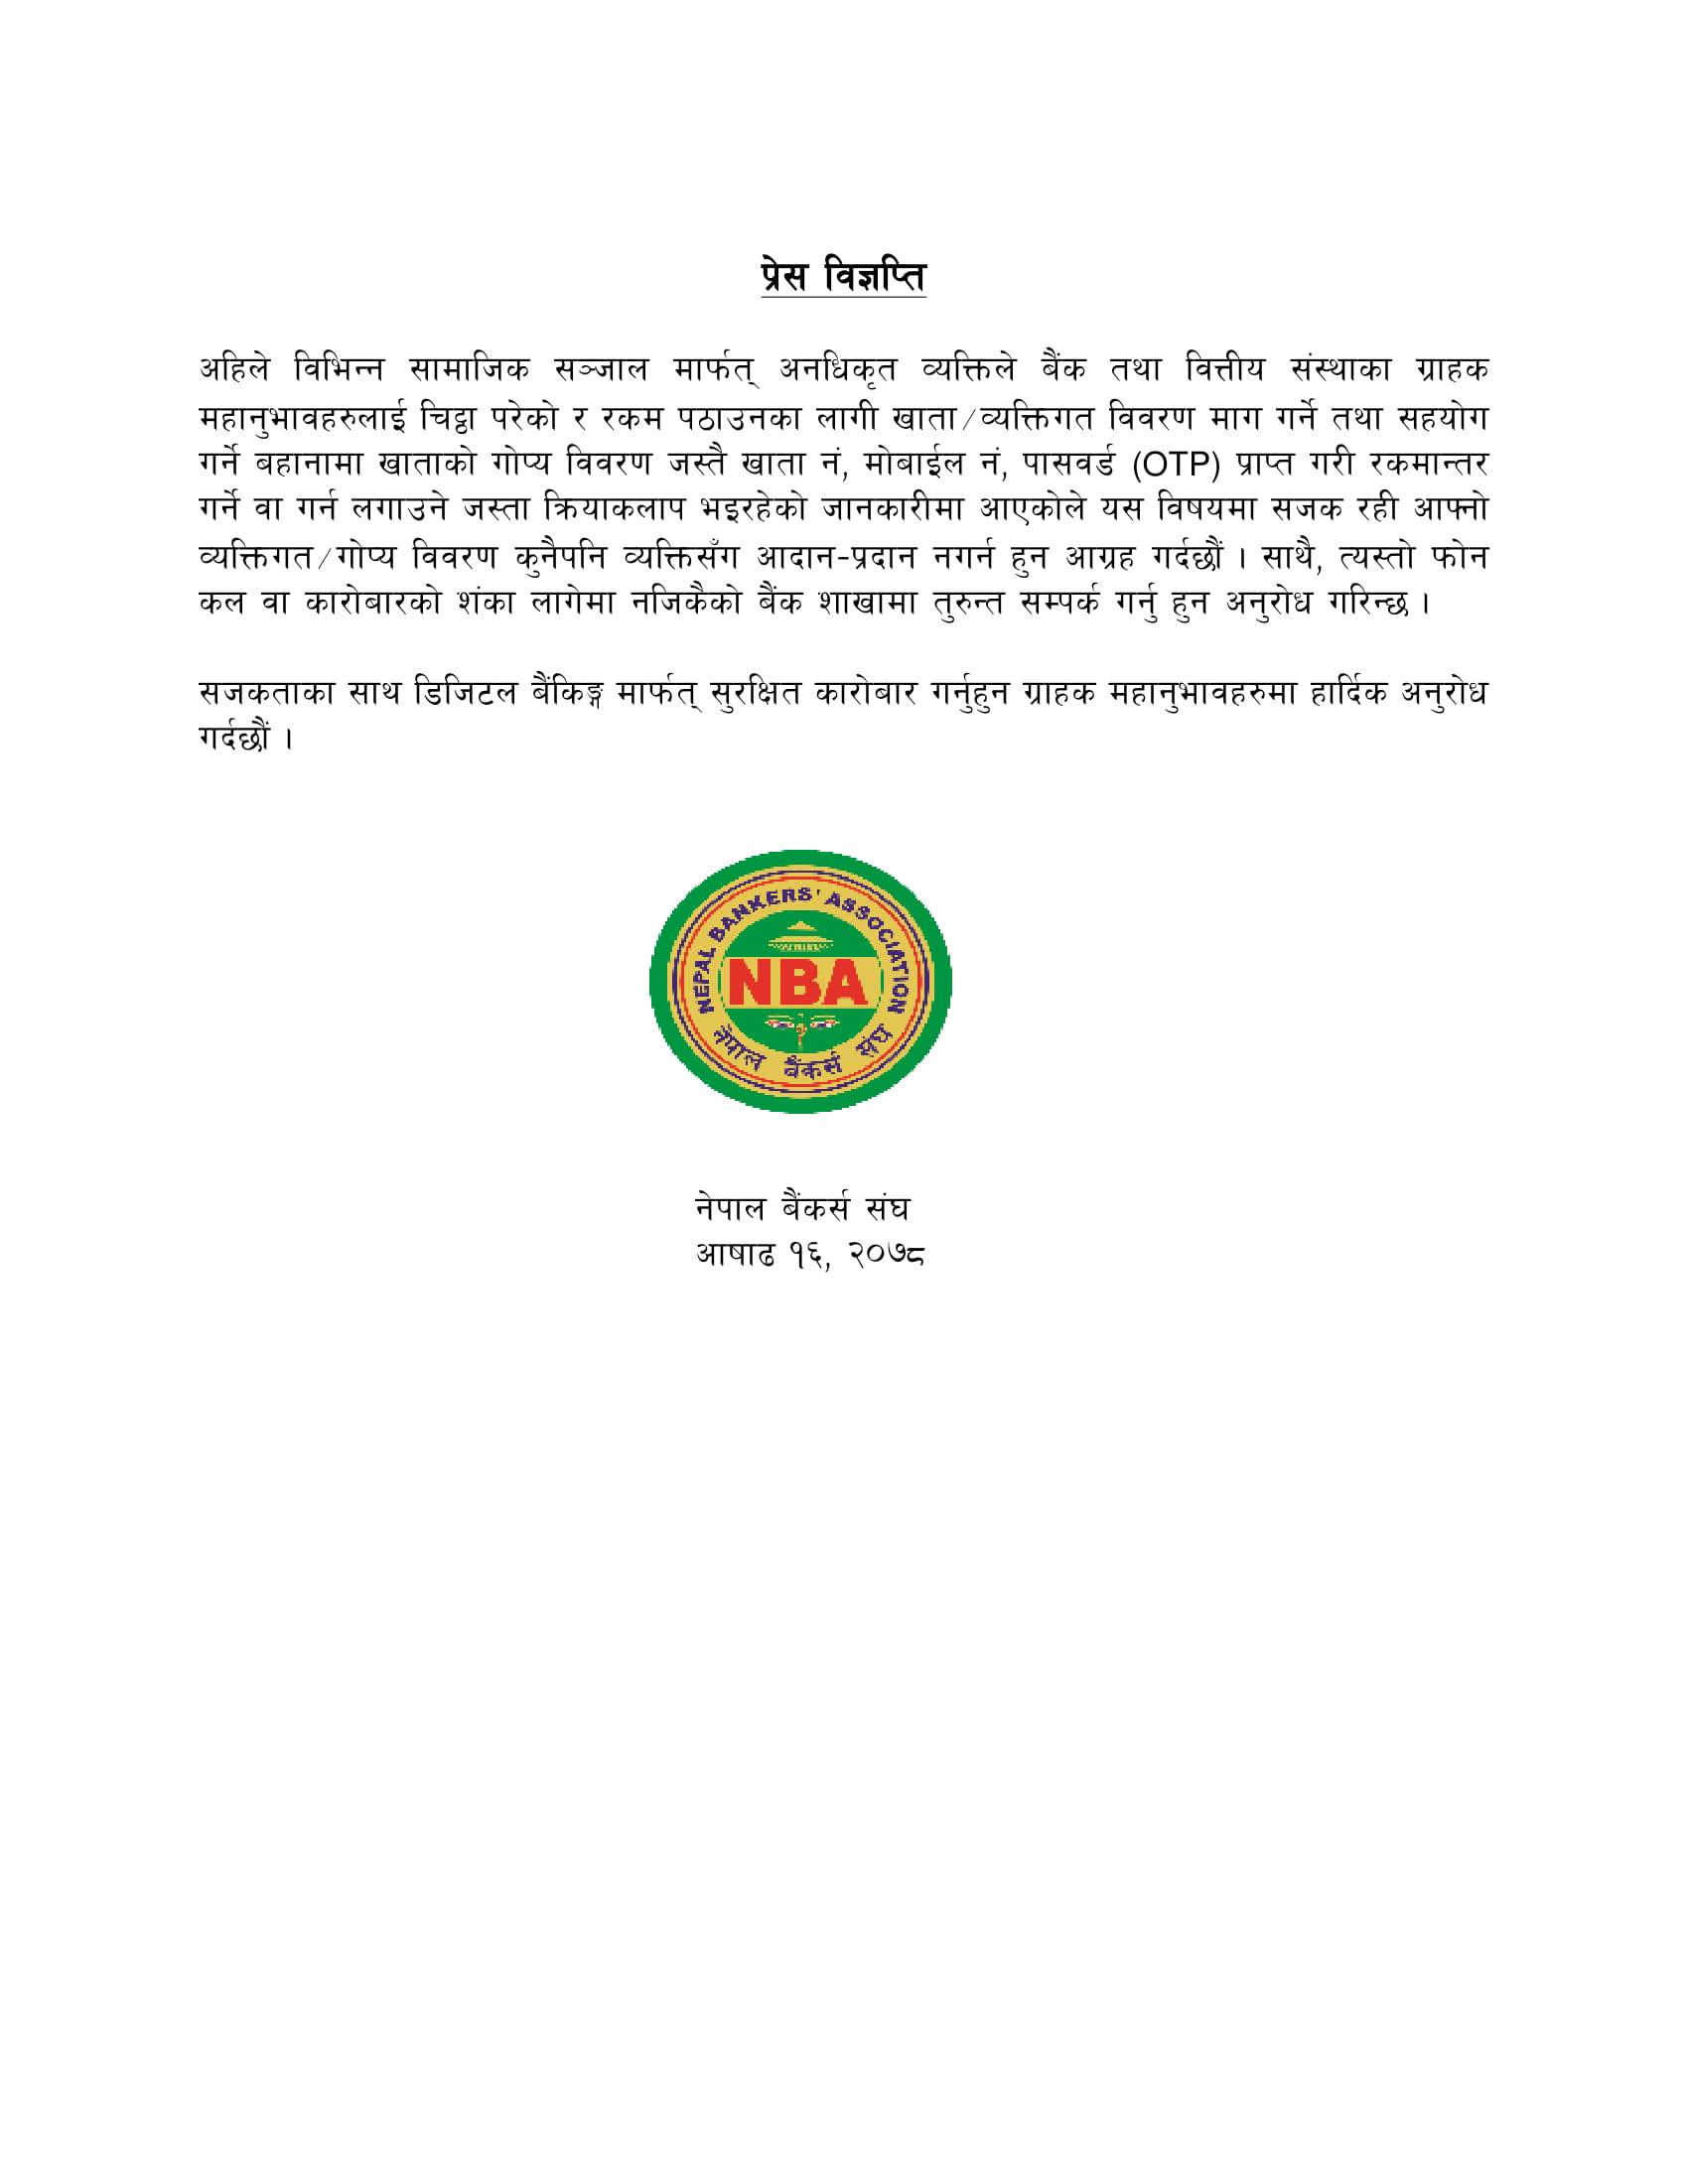 Press Release 16 Ashad, 2078